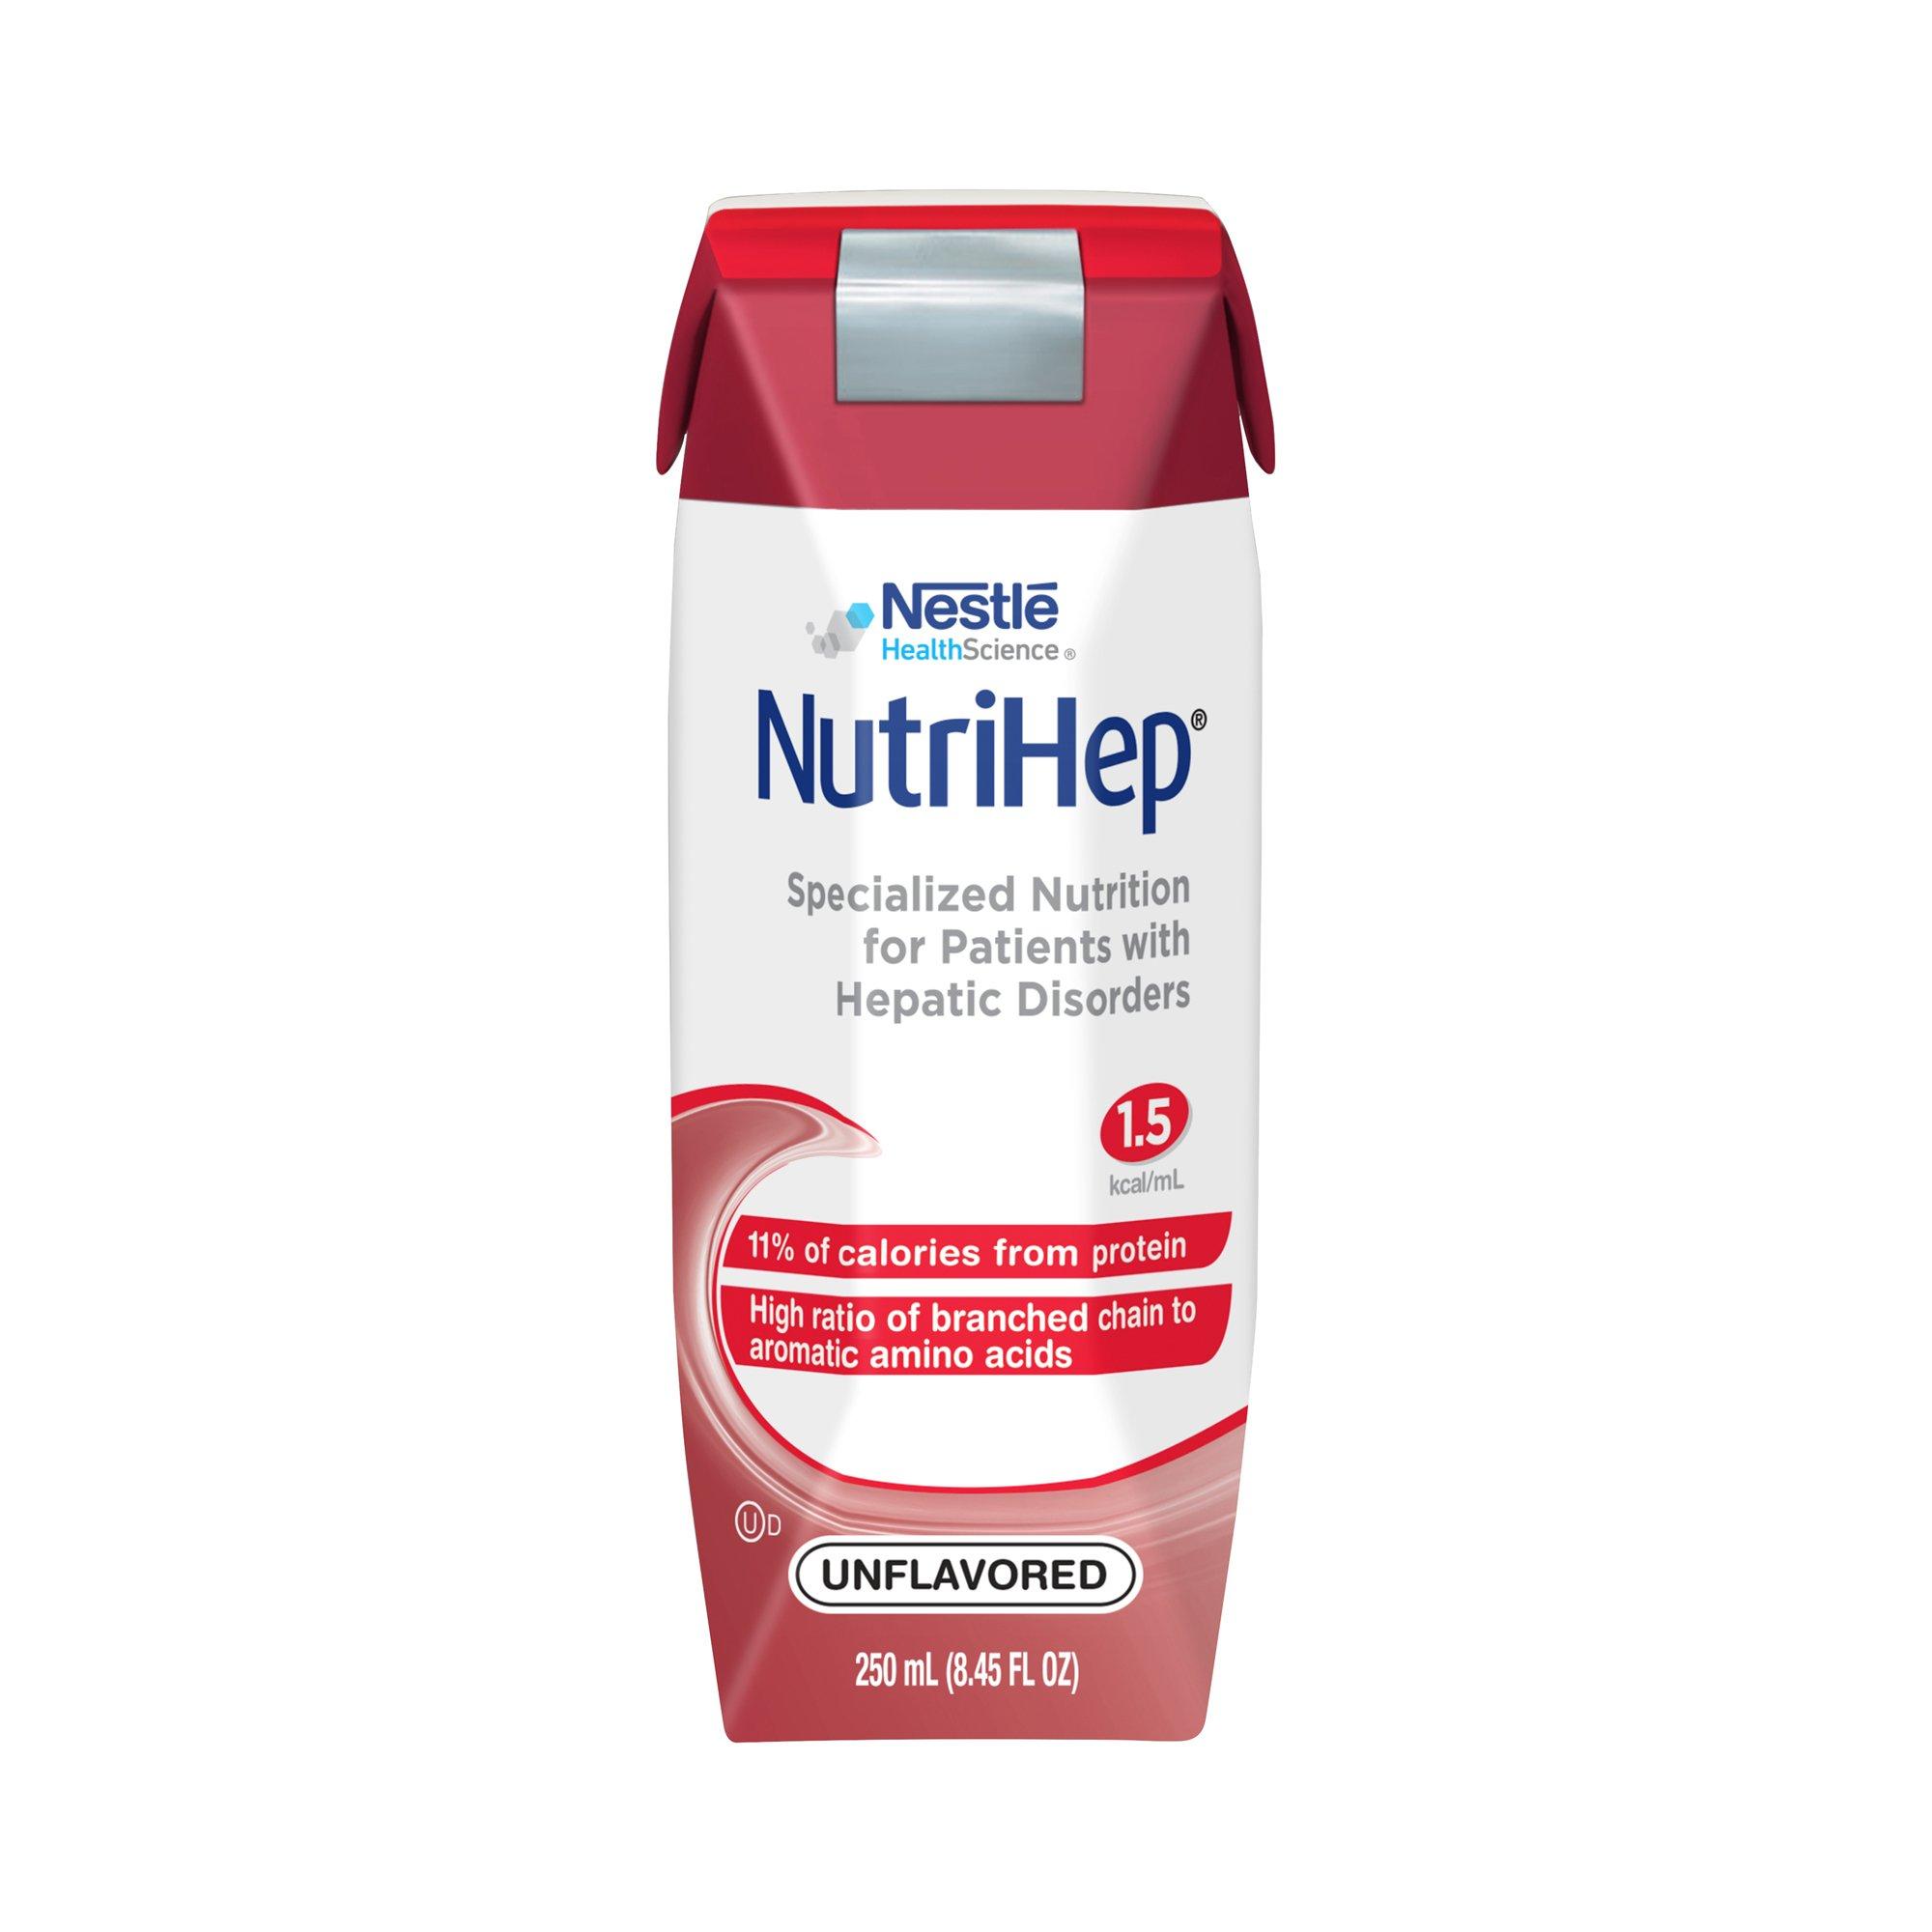 Nestle HealthScience NutriHep Specialized Nutrition Tube Feeding Formula, 8.45 oz, 9871616479, 1 Each